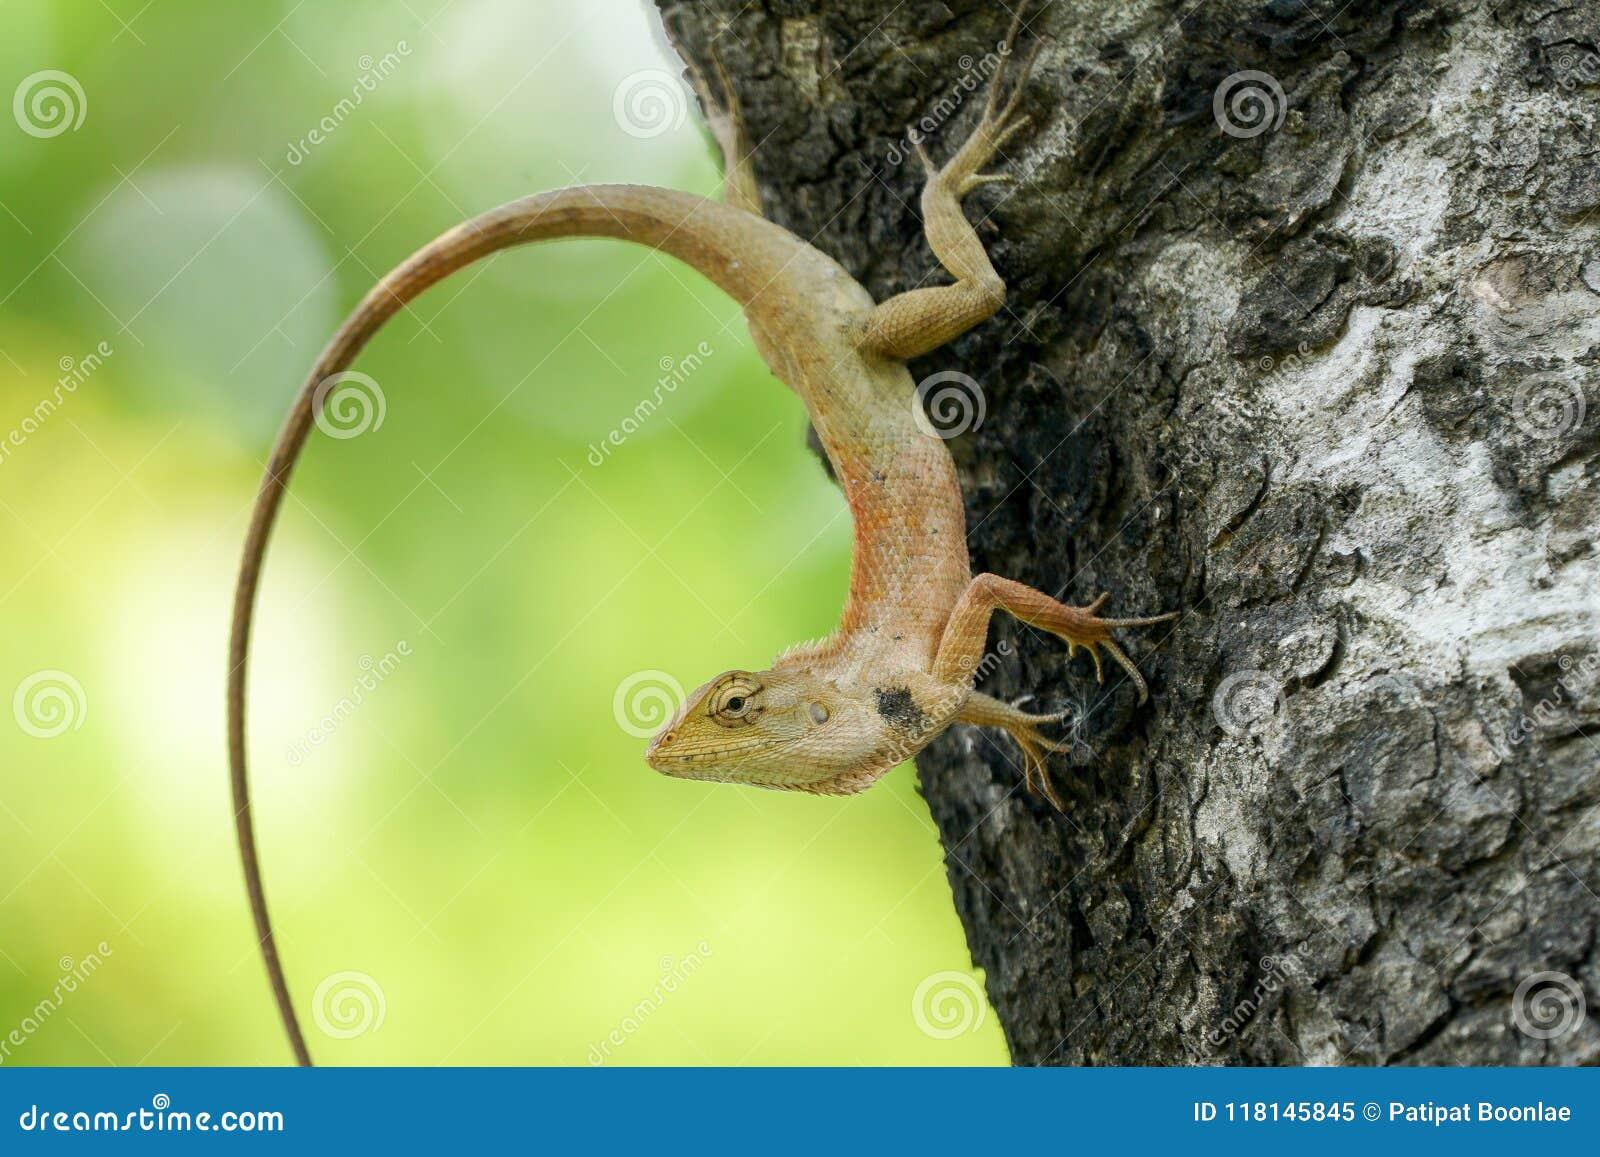 oriental garden lizard with its half orange body stock image